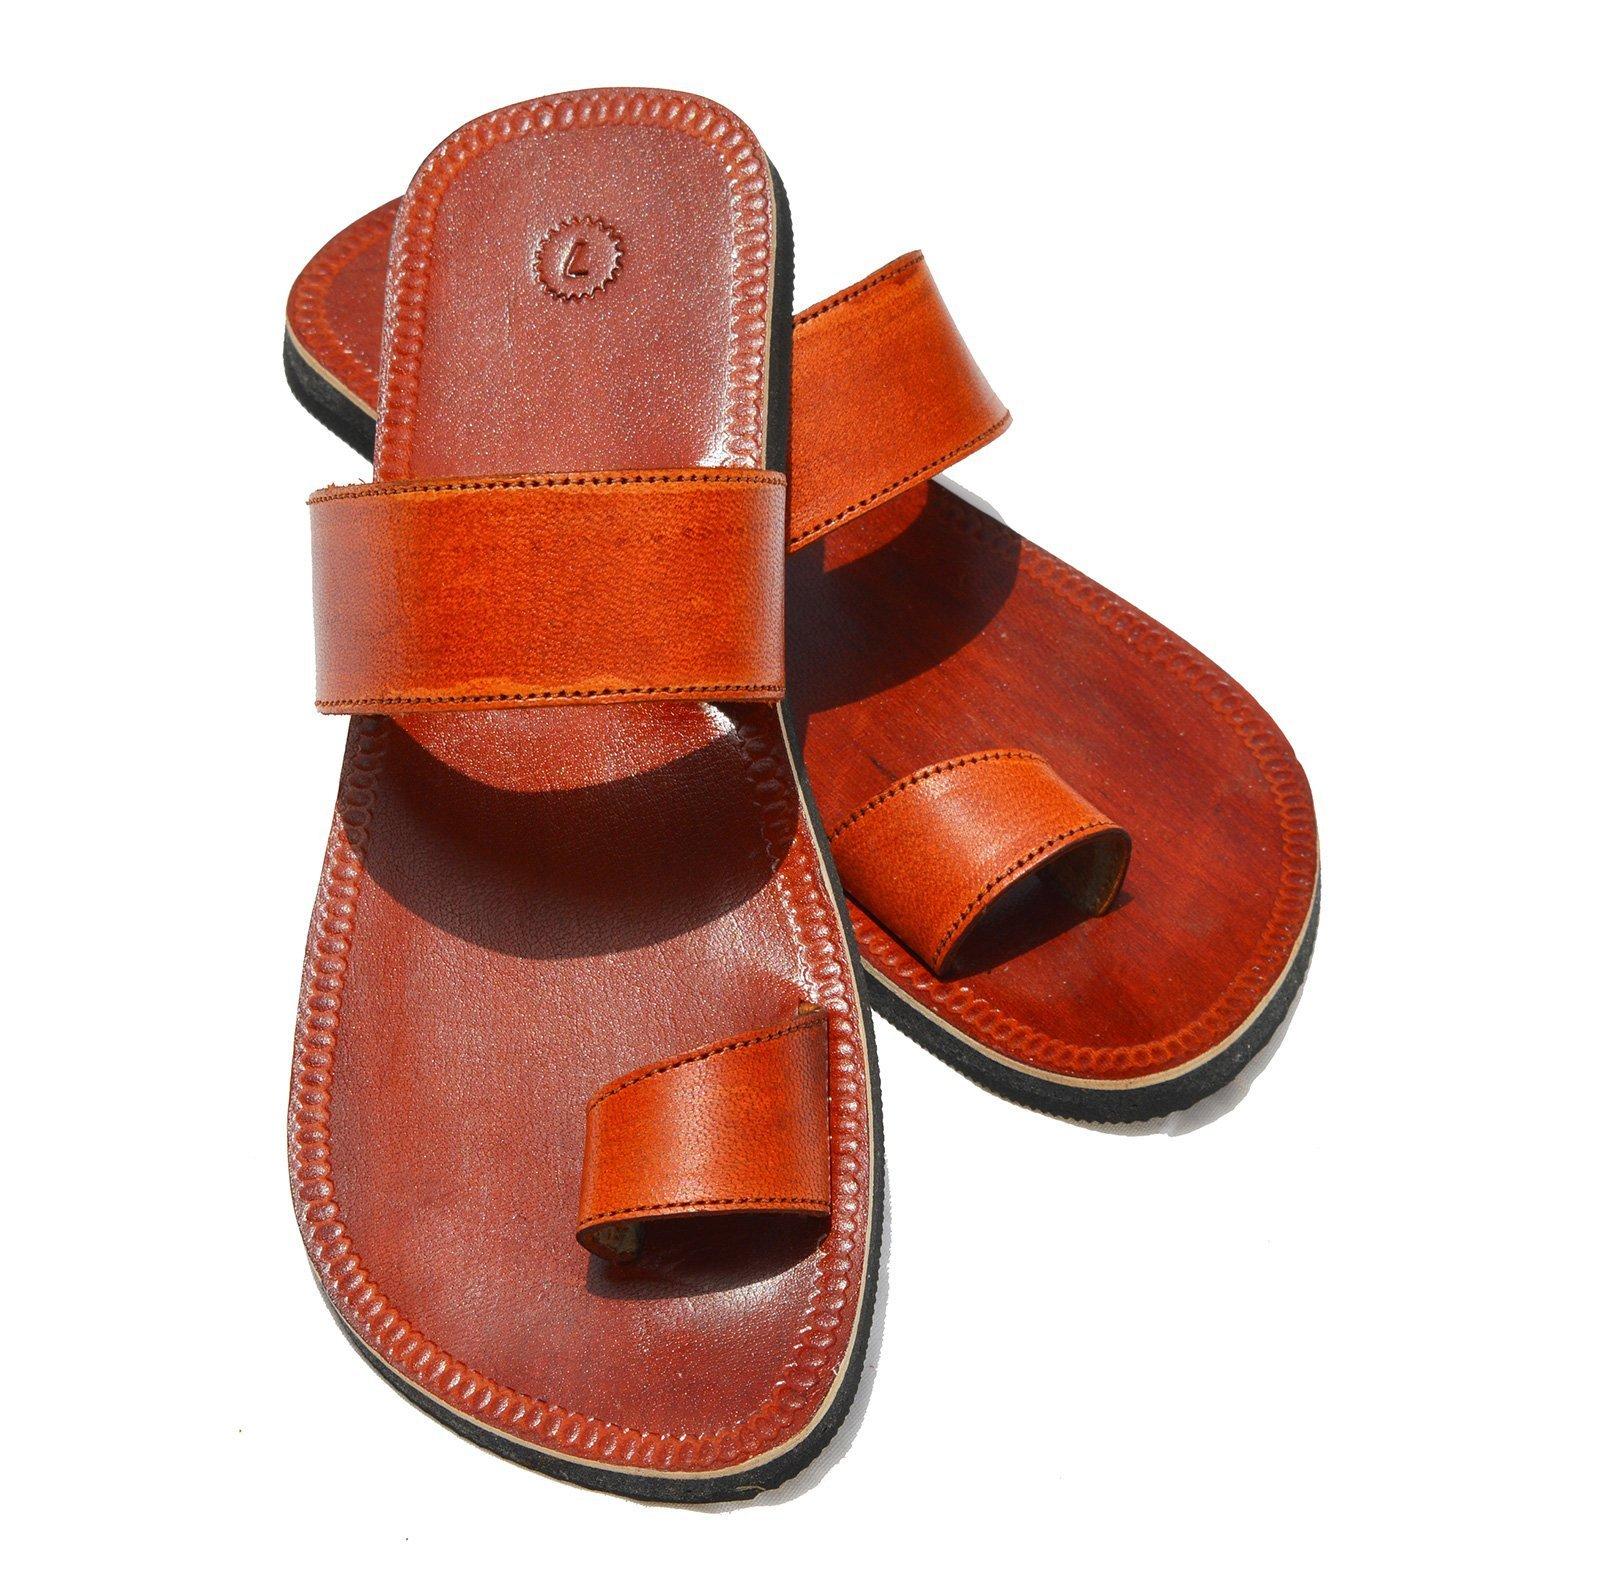 Handcrafted Luxury Men Biblical Leather Sandals Jesus Sandals Brown Leather Flip Flops Finger Style Hippie Indian Sandals (US 8)